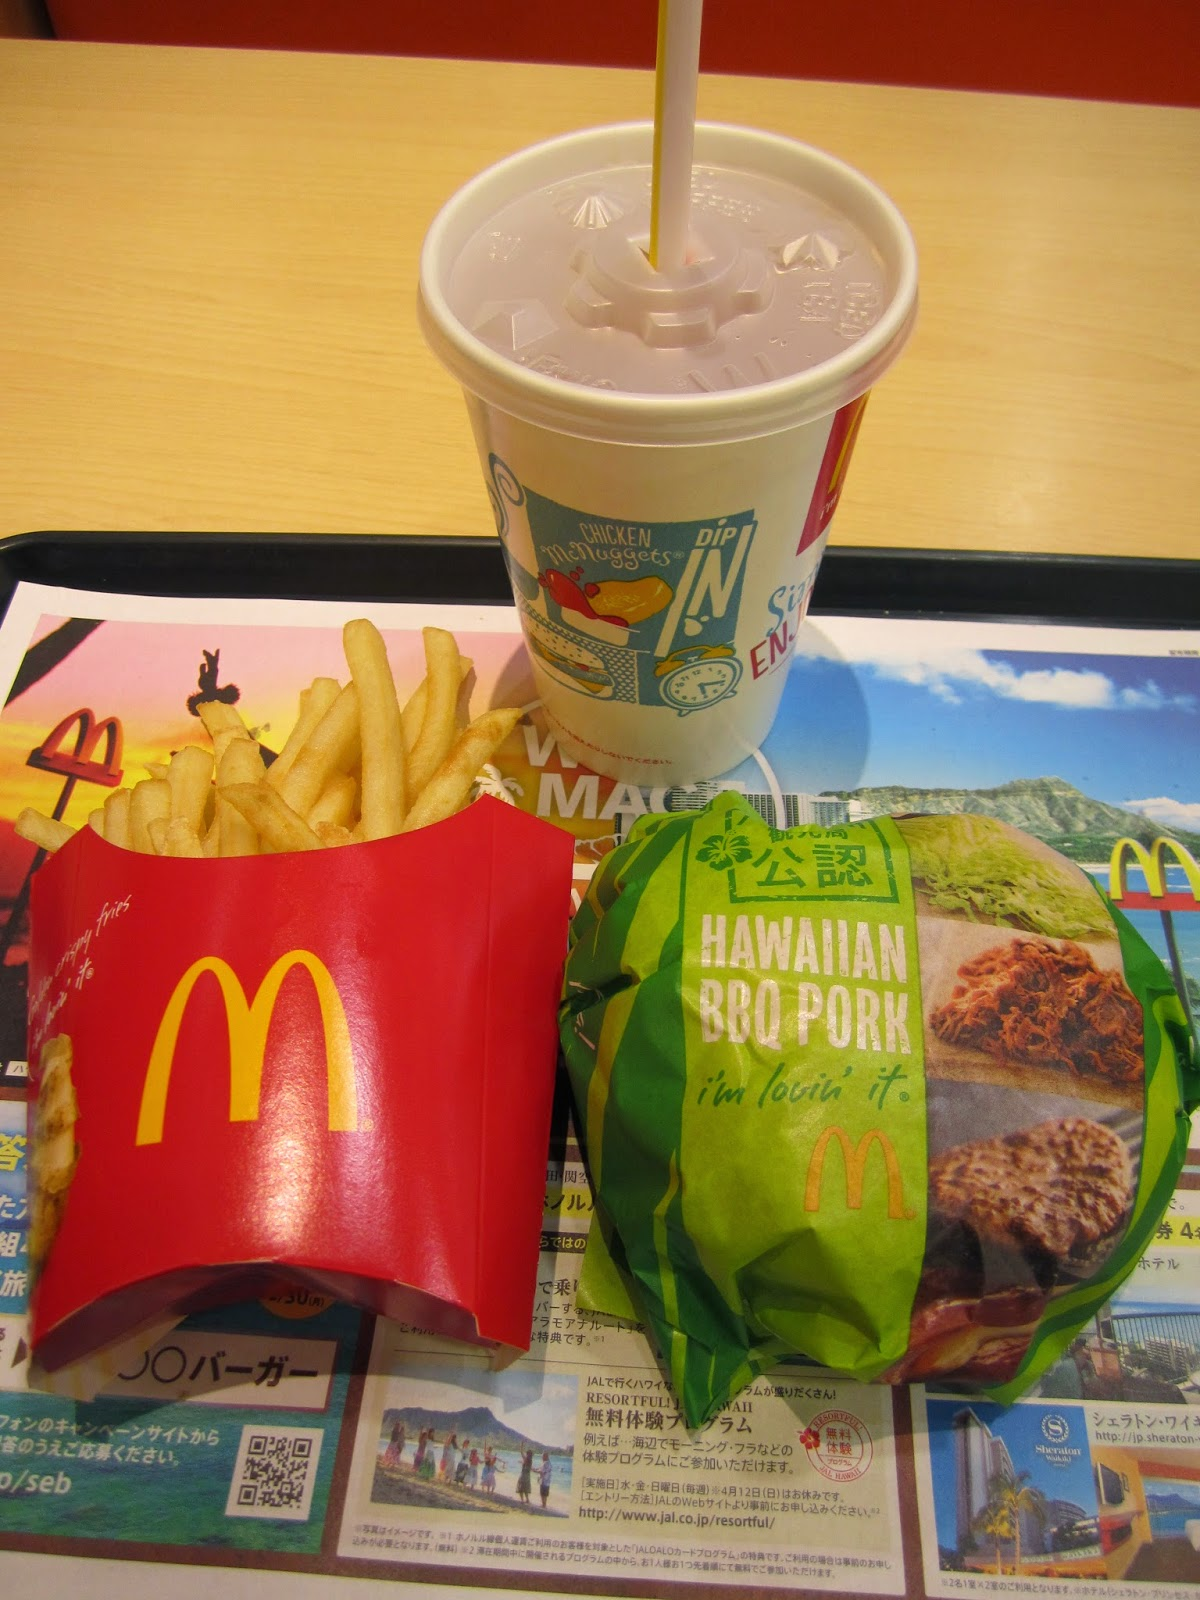 Hawaiian BBQ Pork Burger McDonald's Japan ハワイアンバーベキューポークバーガーマクドナルド